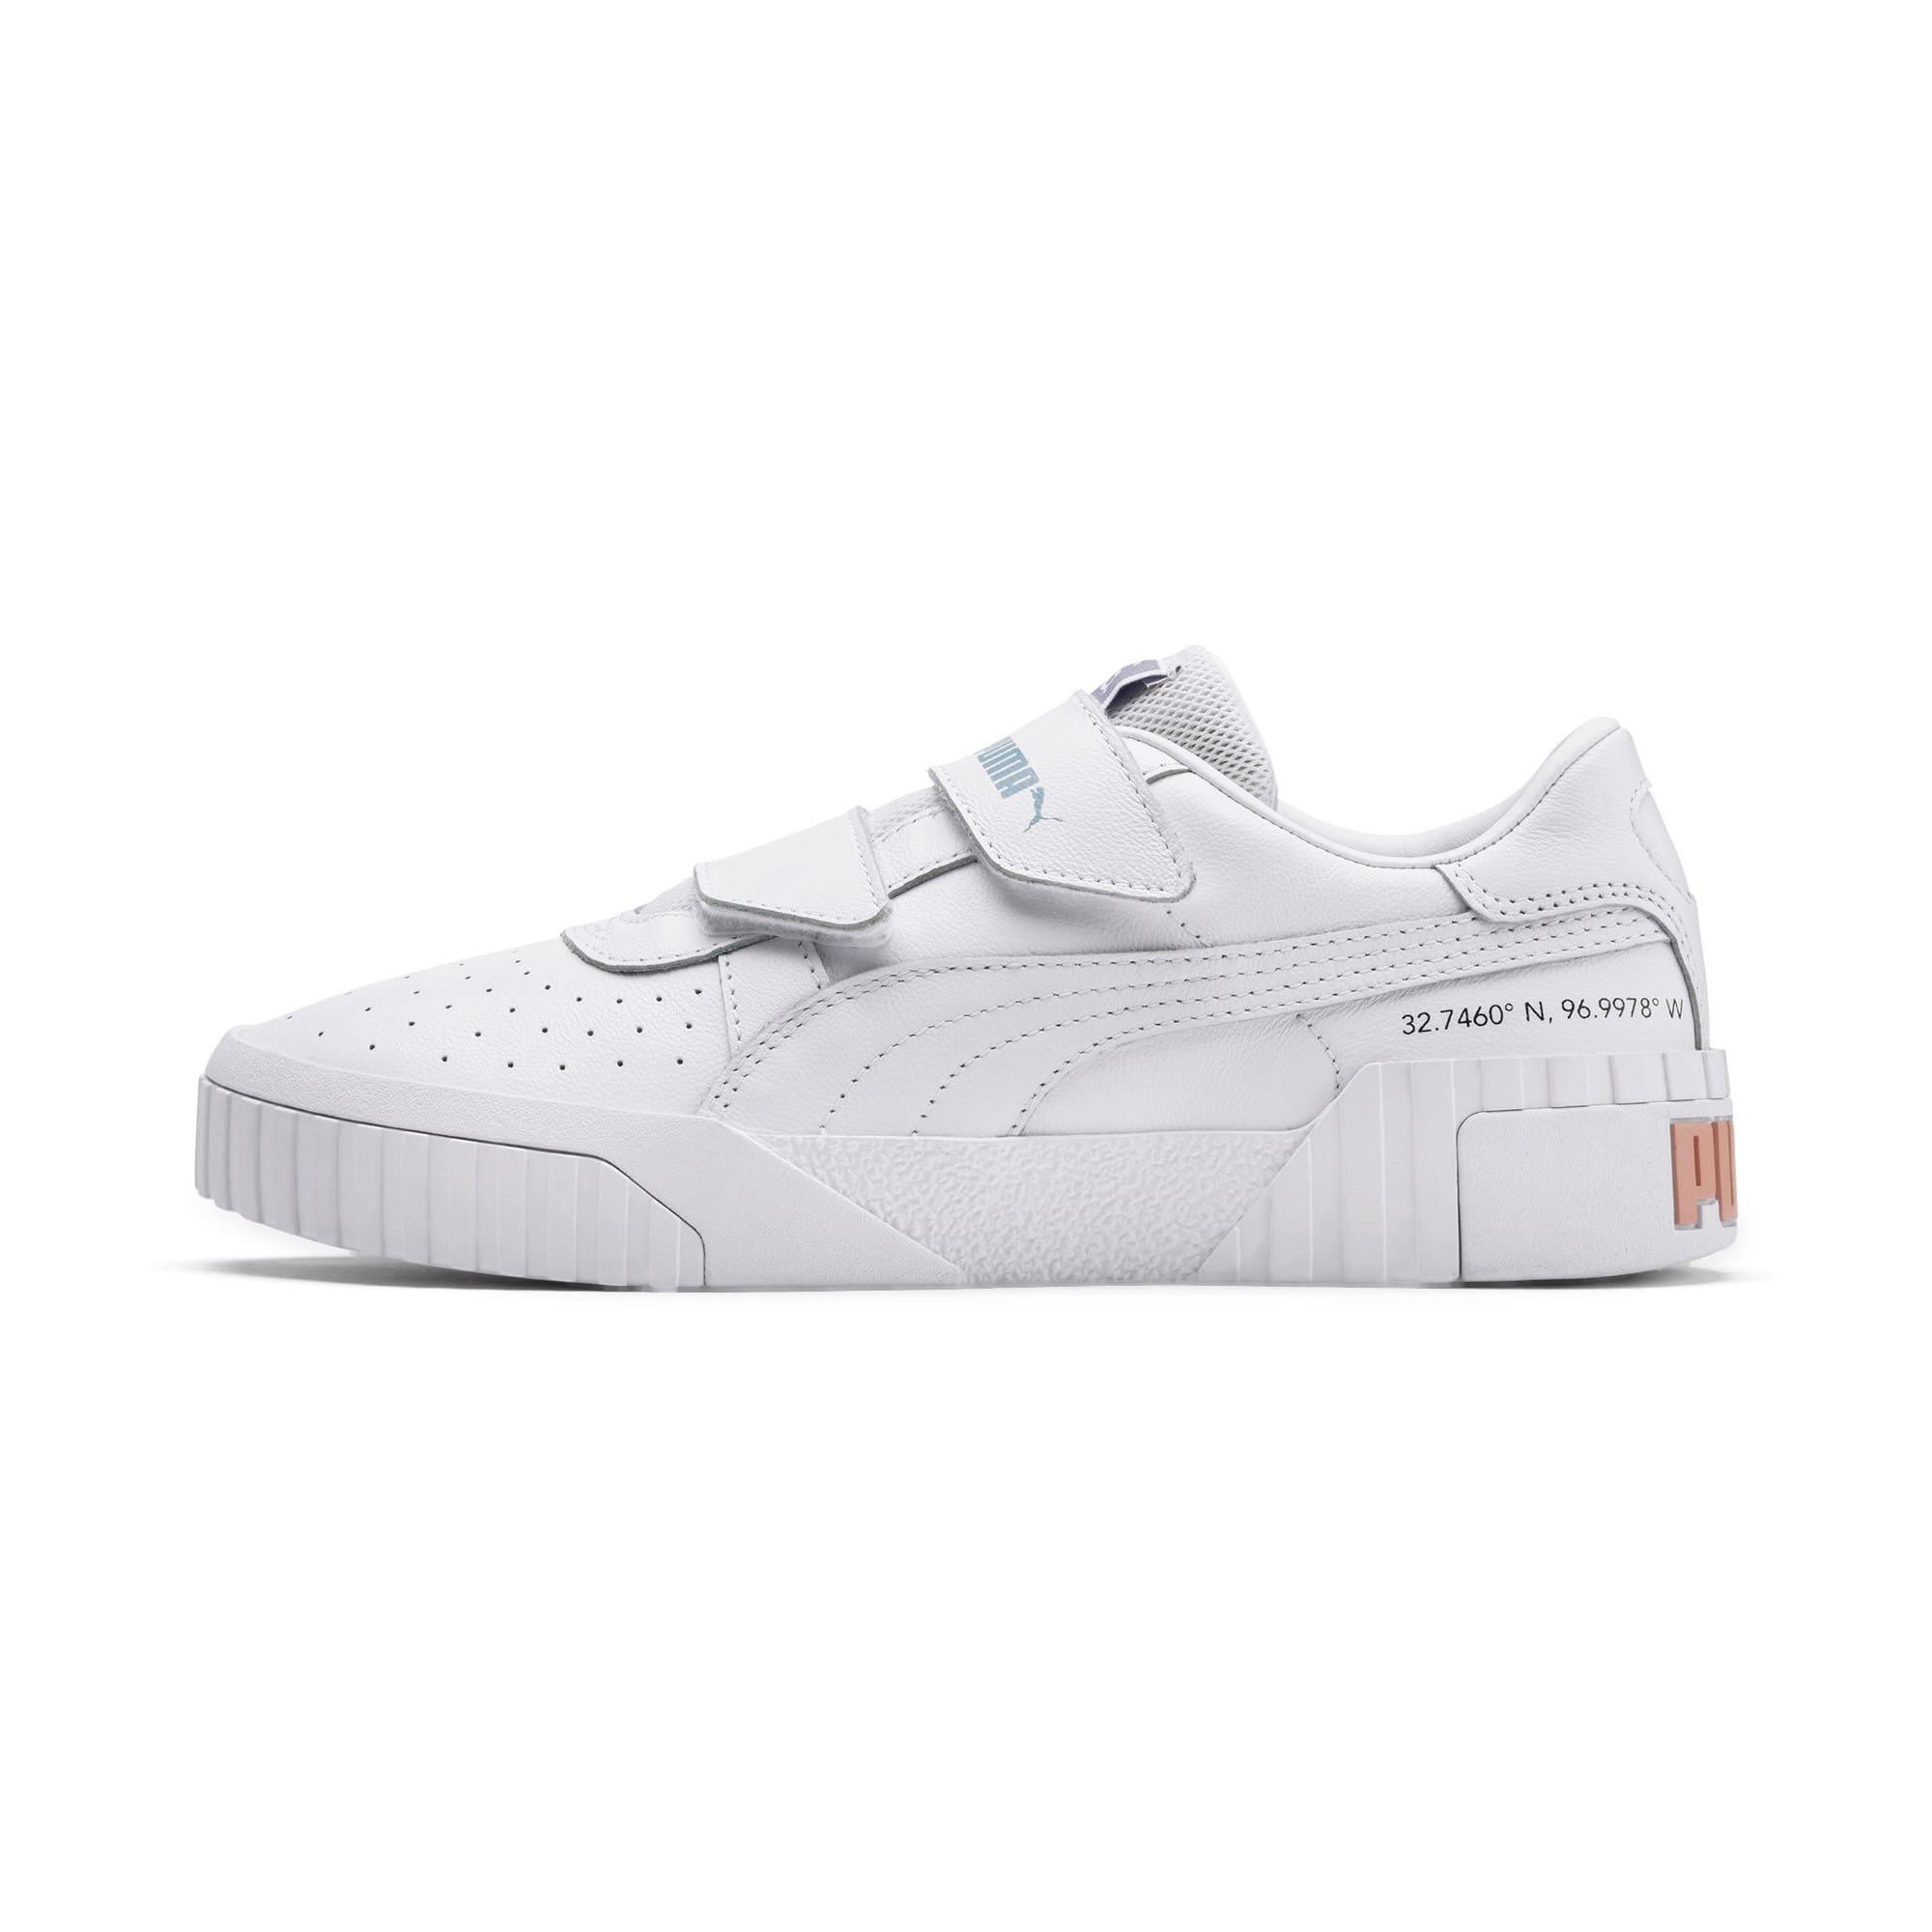 Thumbnail 1 of SG x Cali Women's Sneakers, Puma White-Puma White, medium